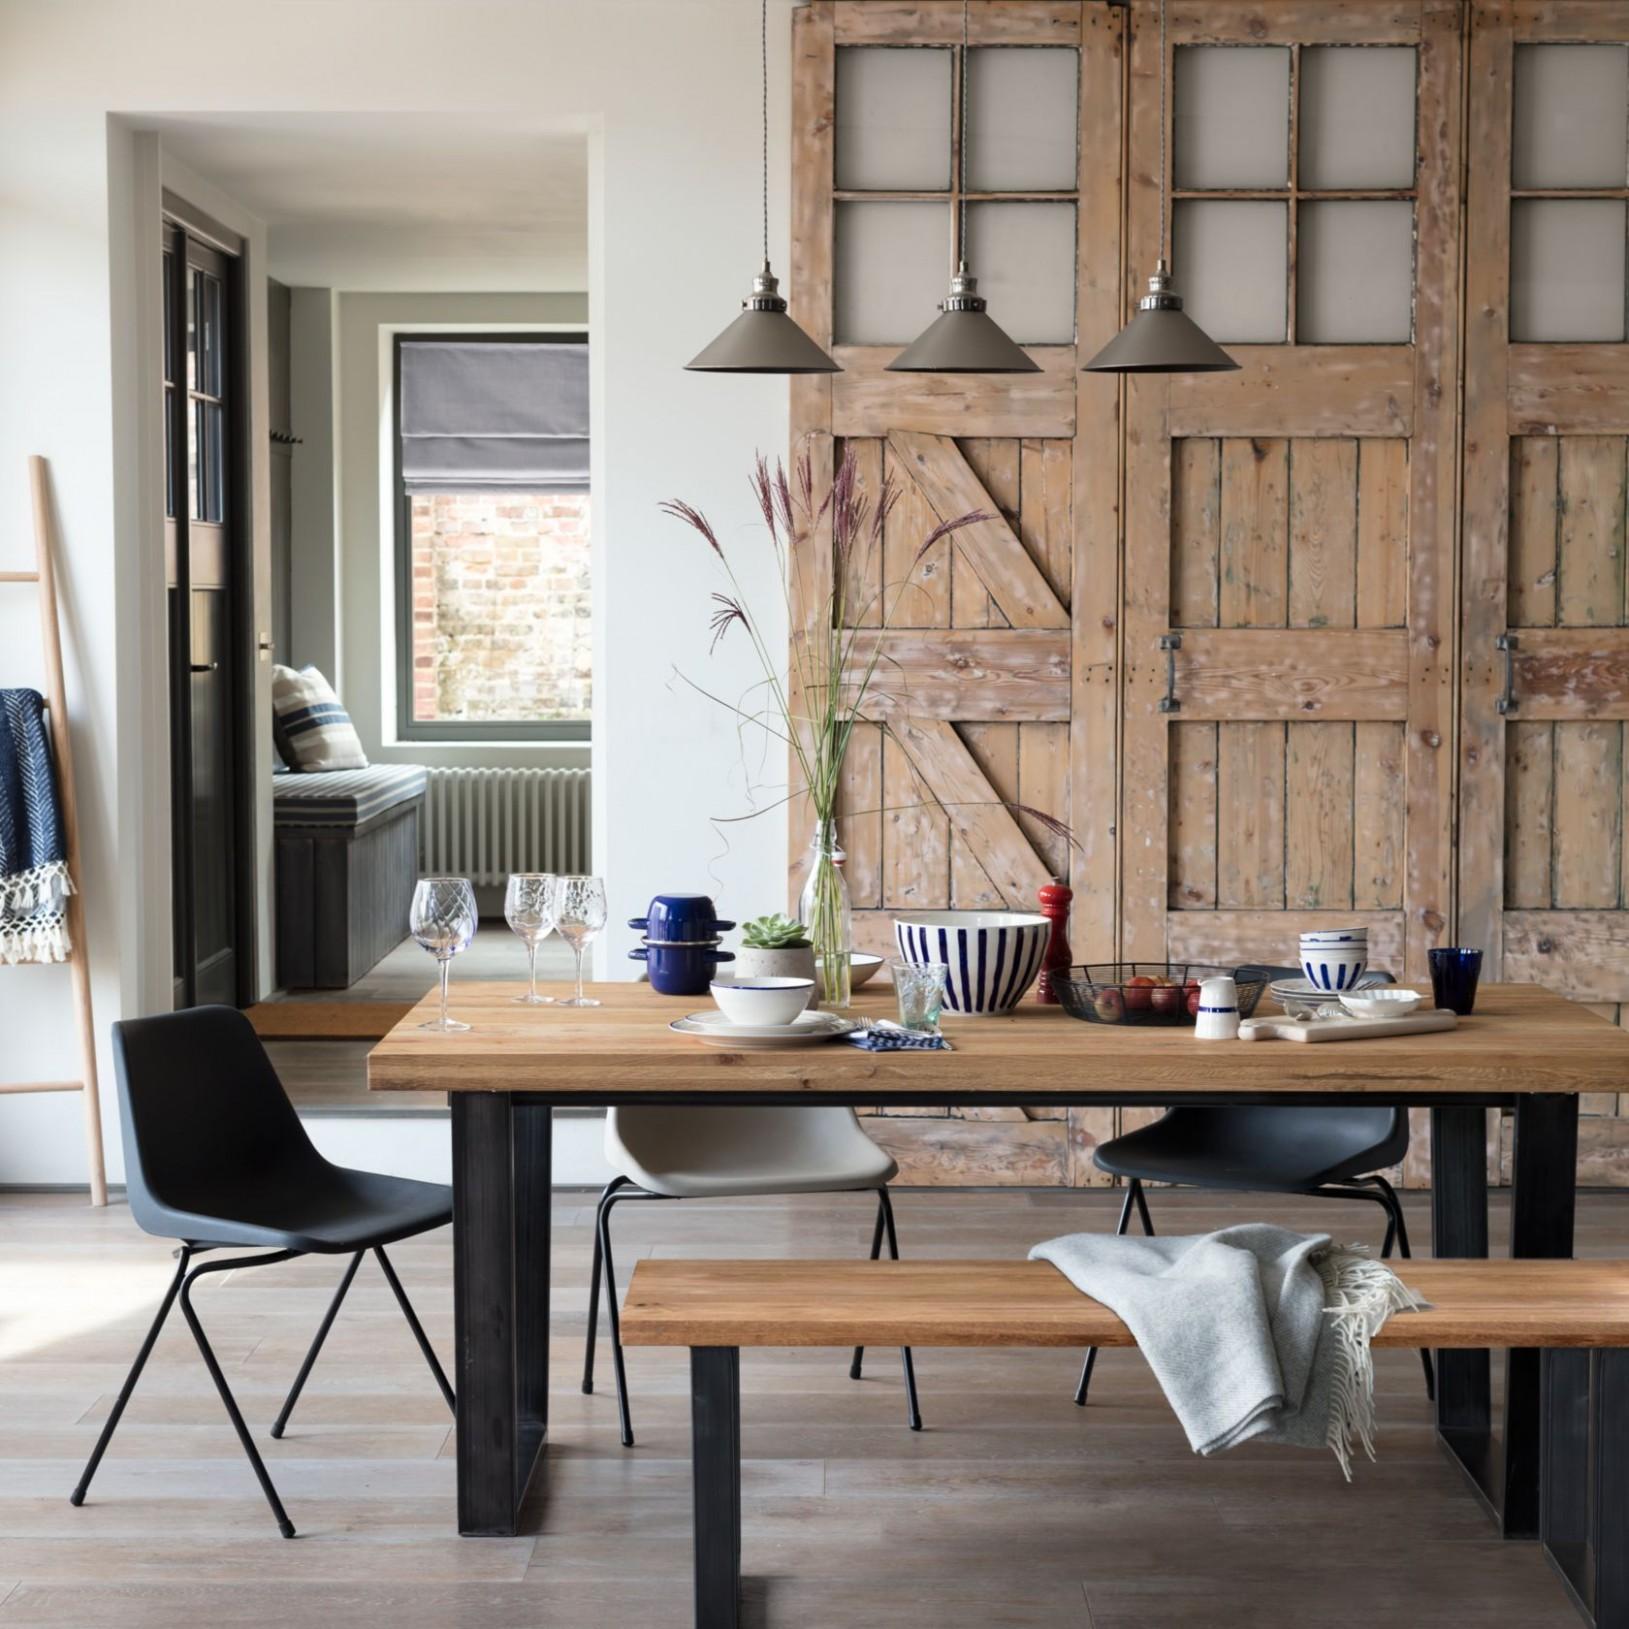 John Lewis & Partners Calia Living & Dining Room Furniture Range - John Lewis Dining Room Ideas